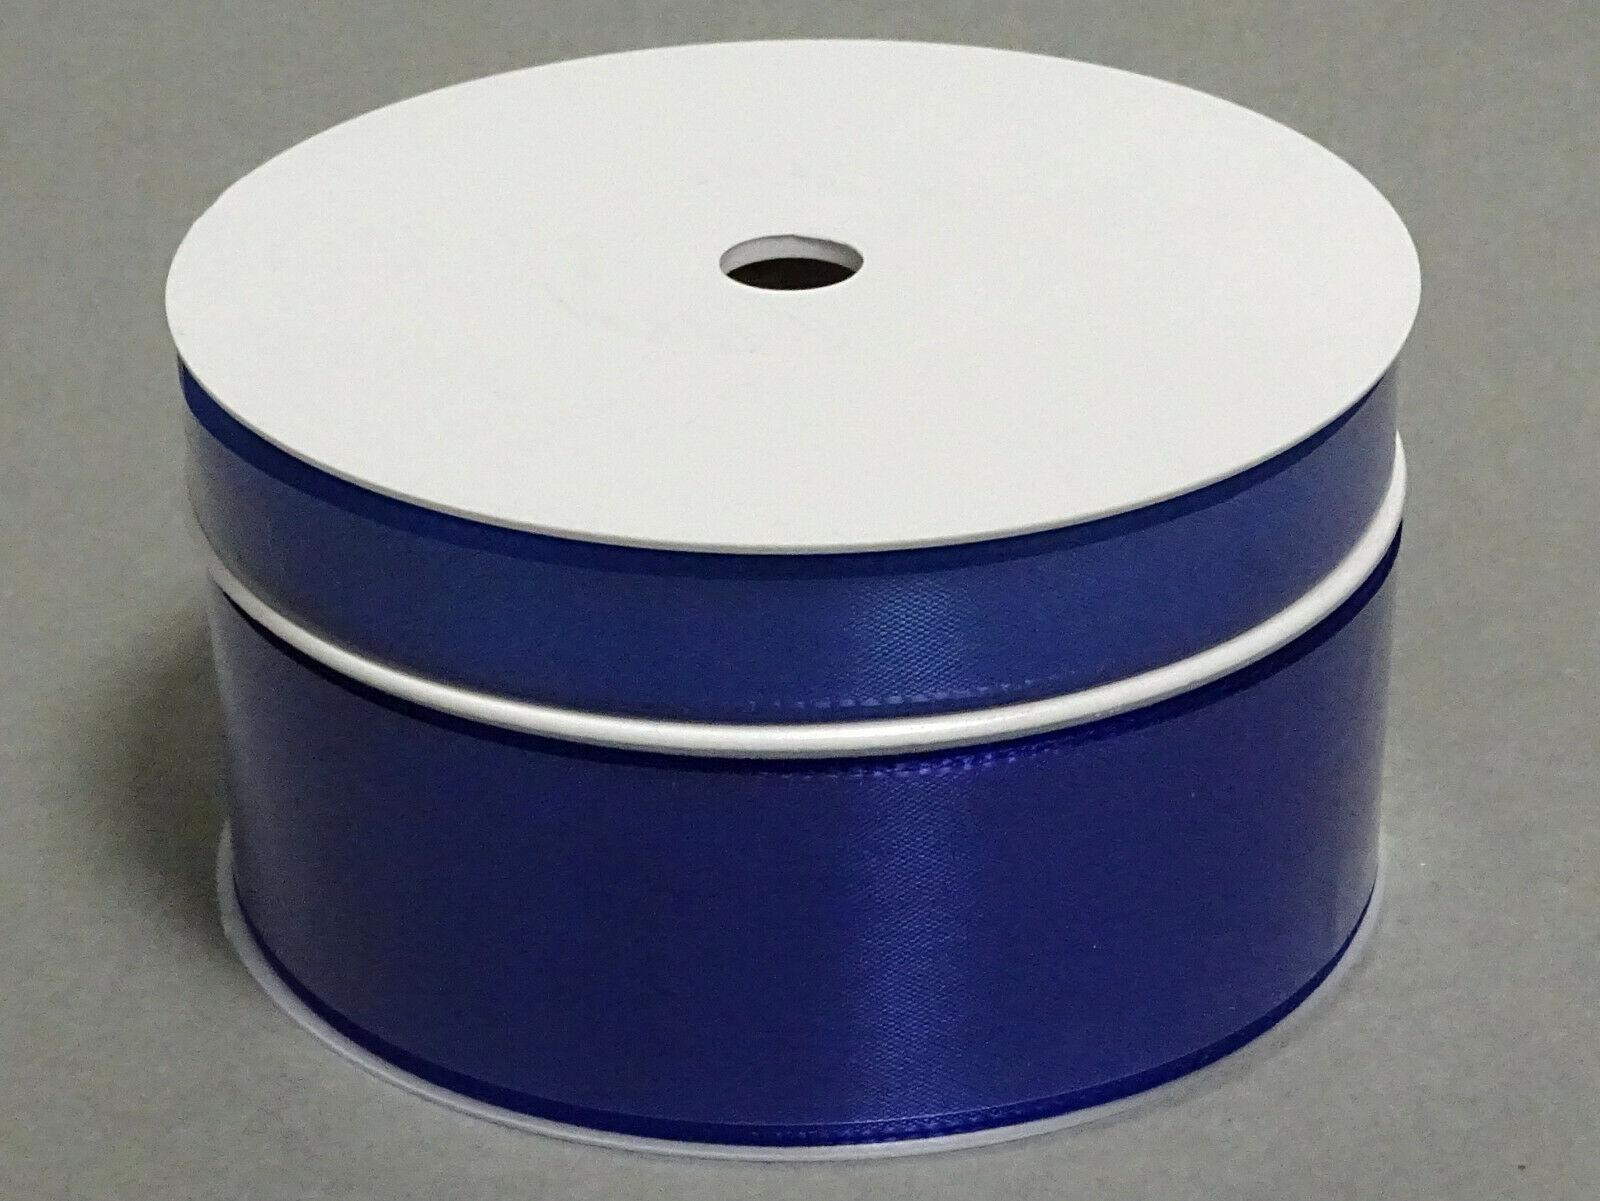 Seidenband Schleifenband 50 m x 15 mm / 40 mm Dekoband ab 0,08 €/m Geschenkband  - Königsblau 120, 40 mm x 50 m